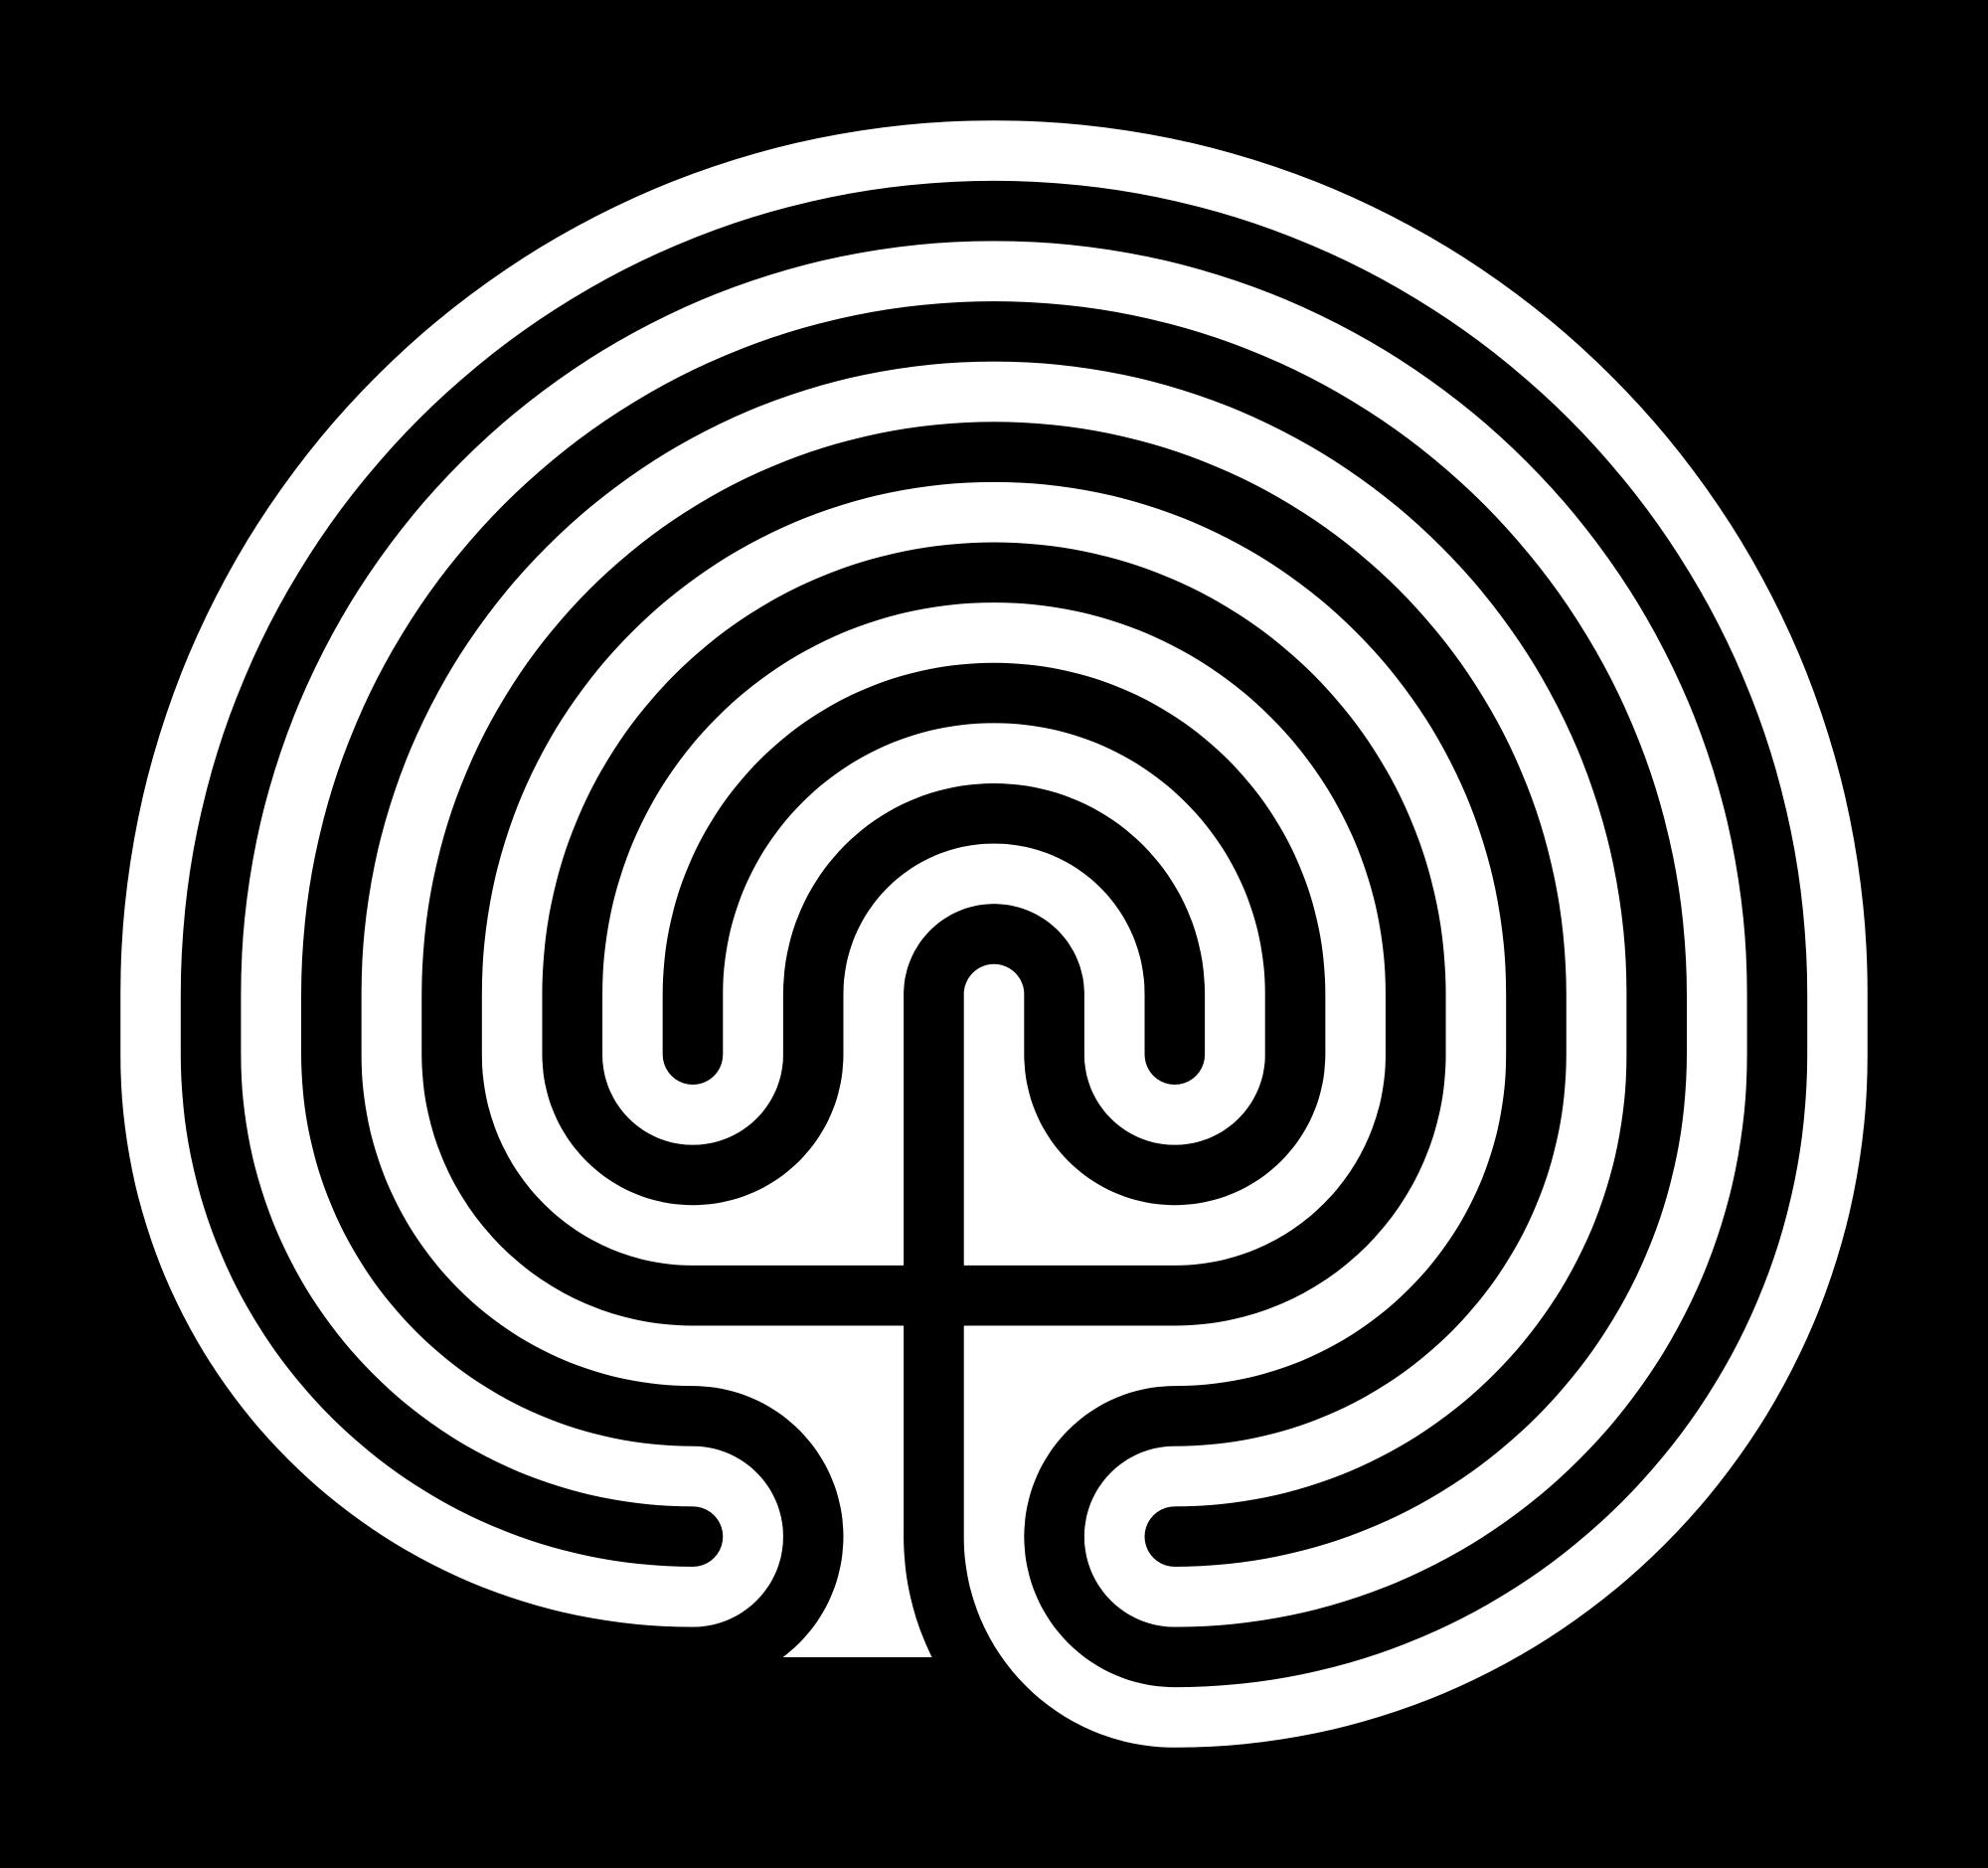 Cretan Labyrinth Round_svg